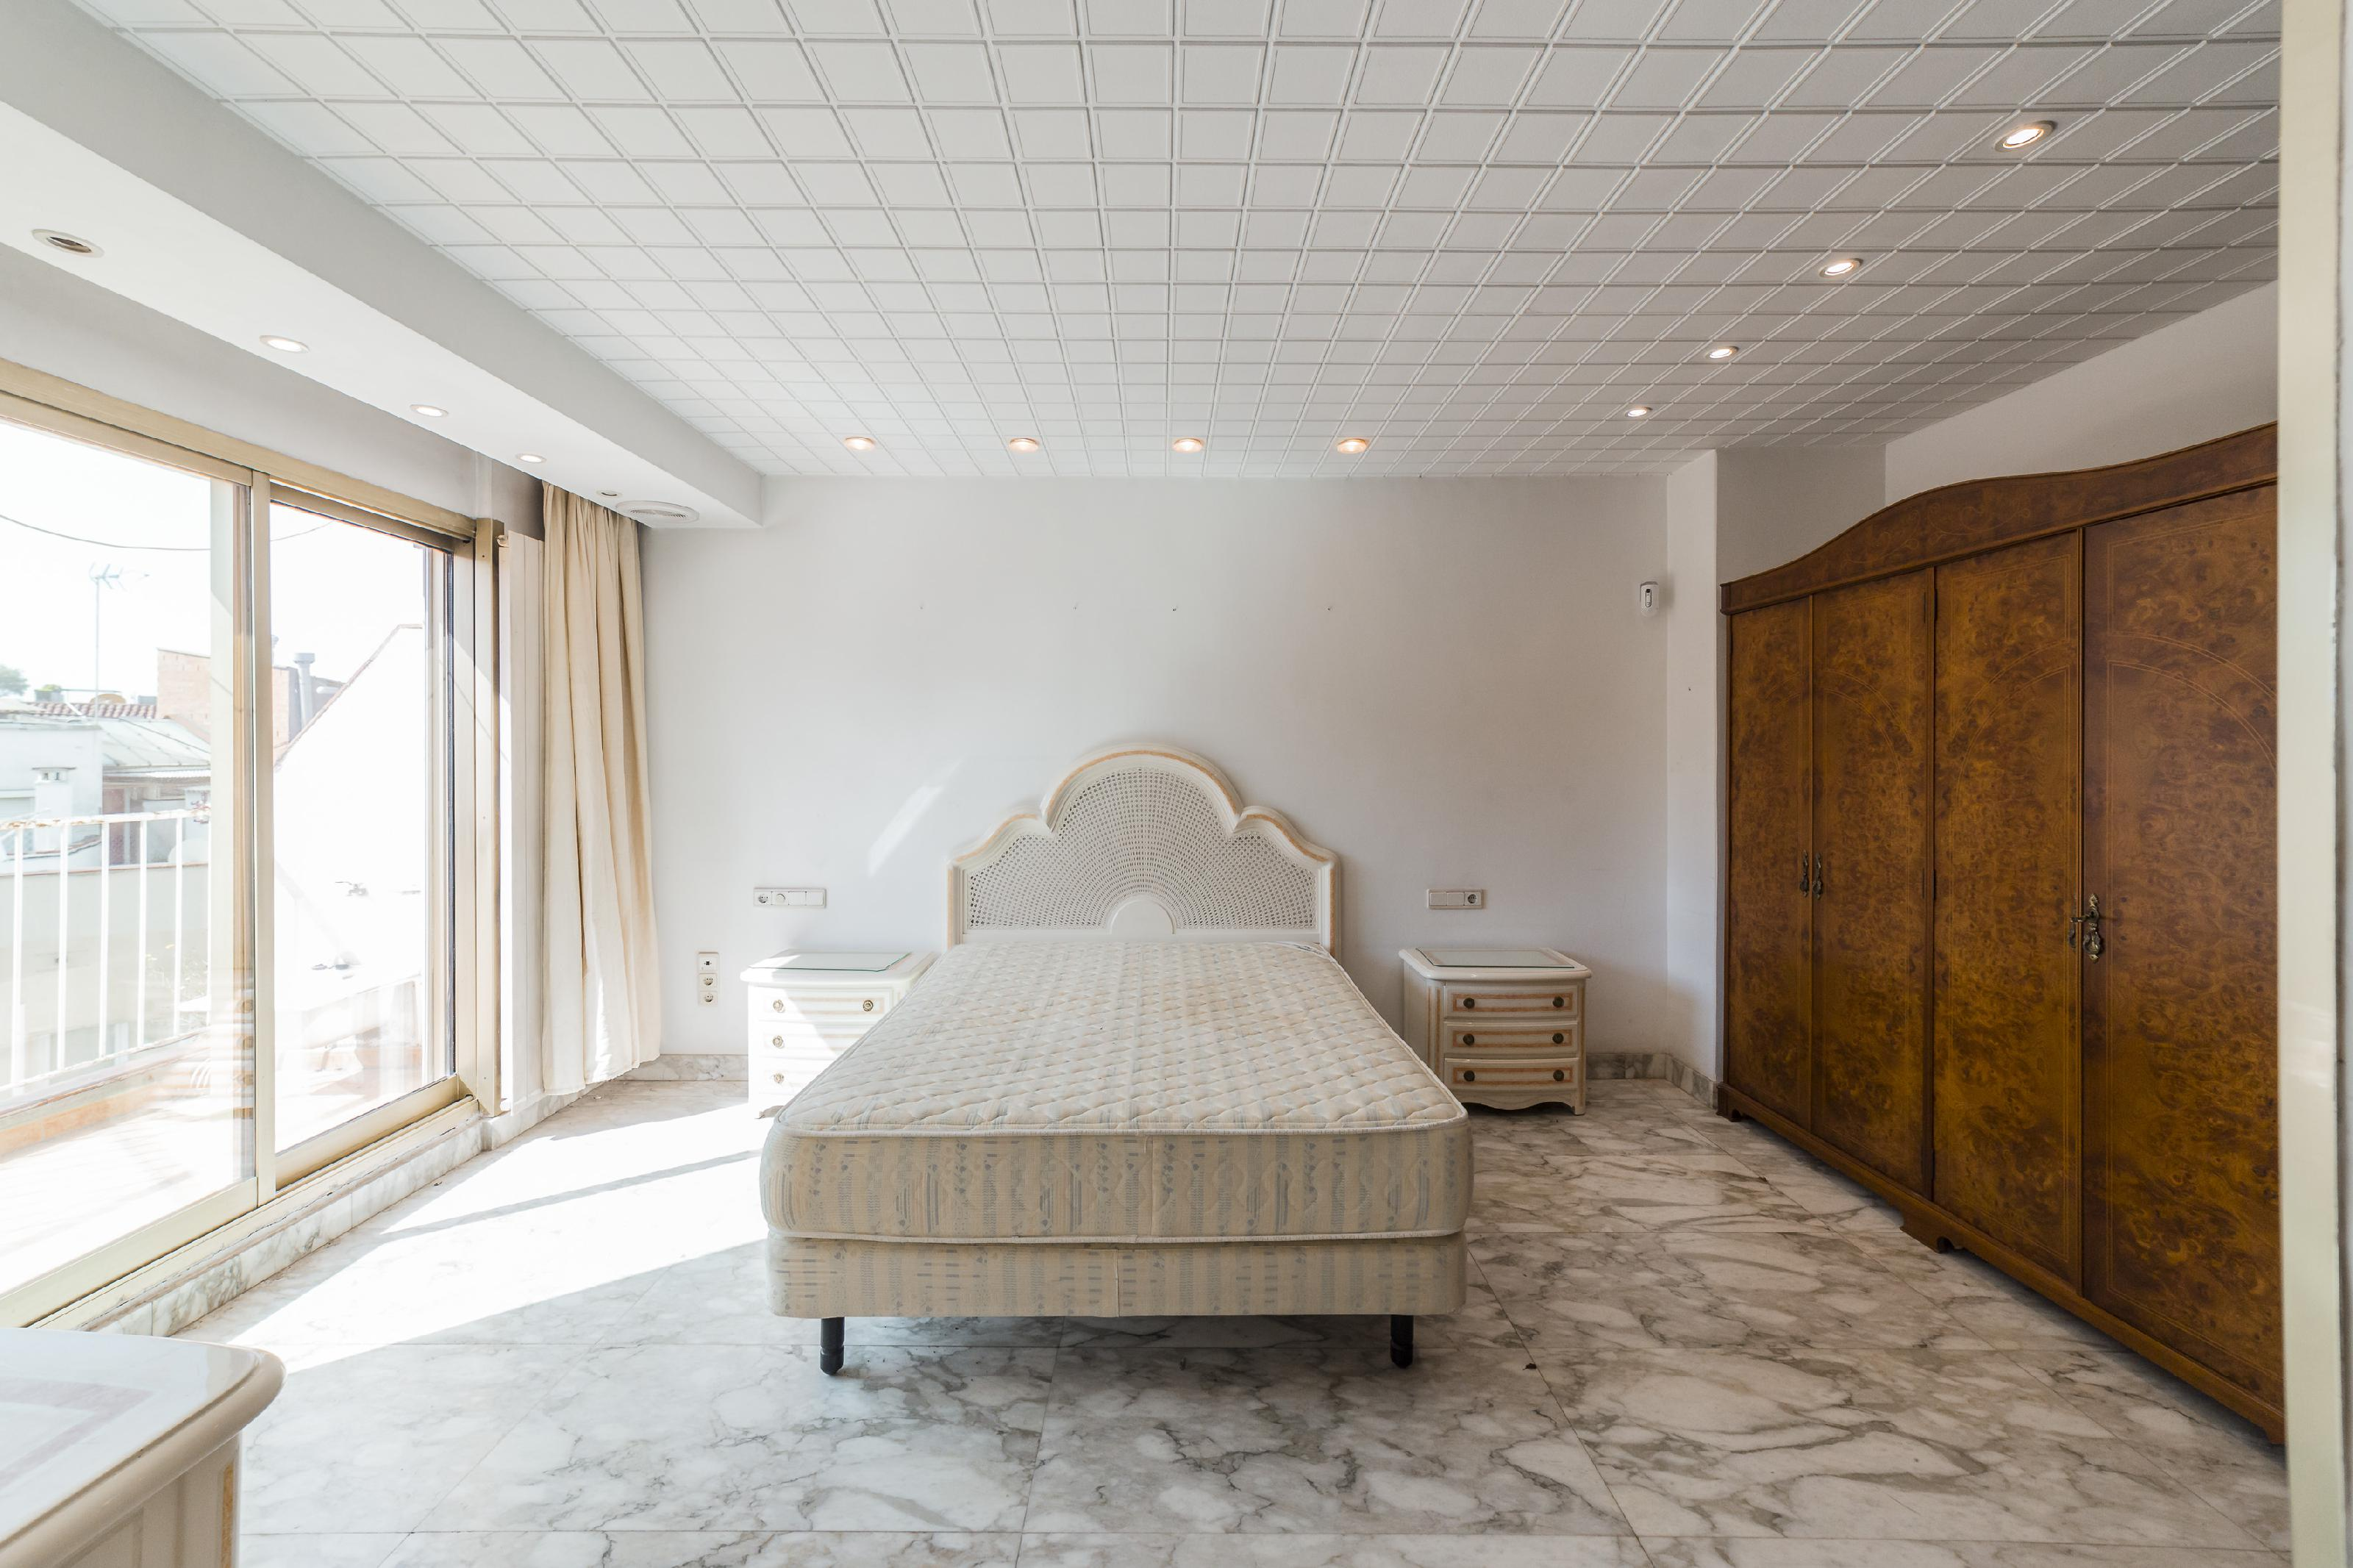 249314 Penthouse for sale in Sarrià-Sant Gervasi, Sant Gervasi-Galvany 22